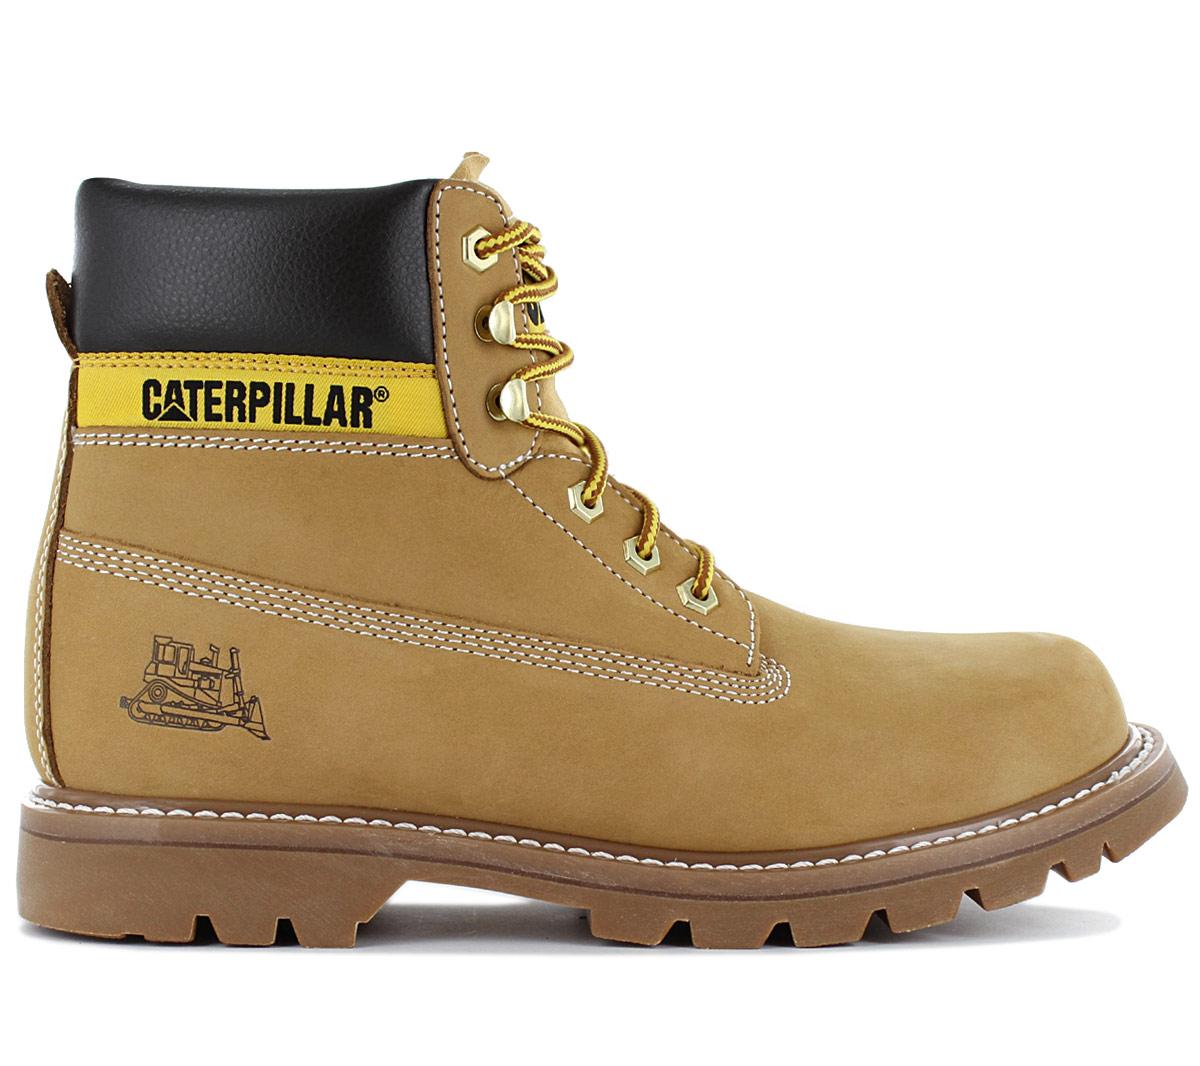 Details about Cat caterpillar Colorado Men's Boots PWC44100 940 Leather Honey Boots Shoes